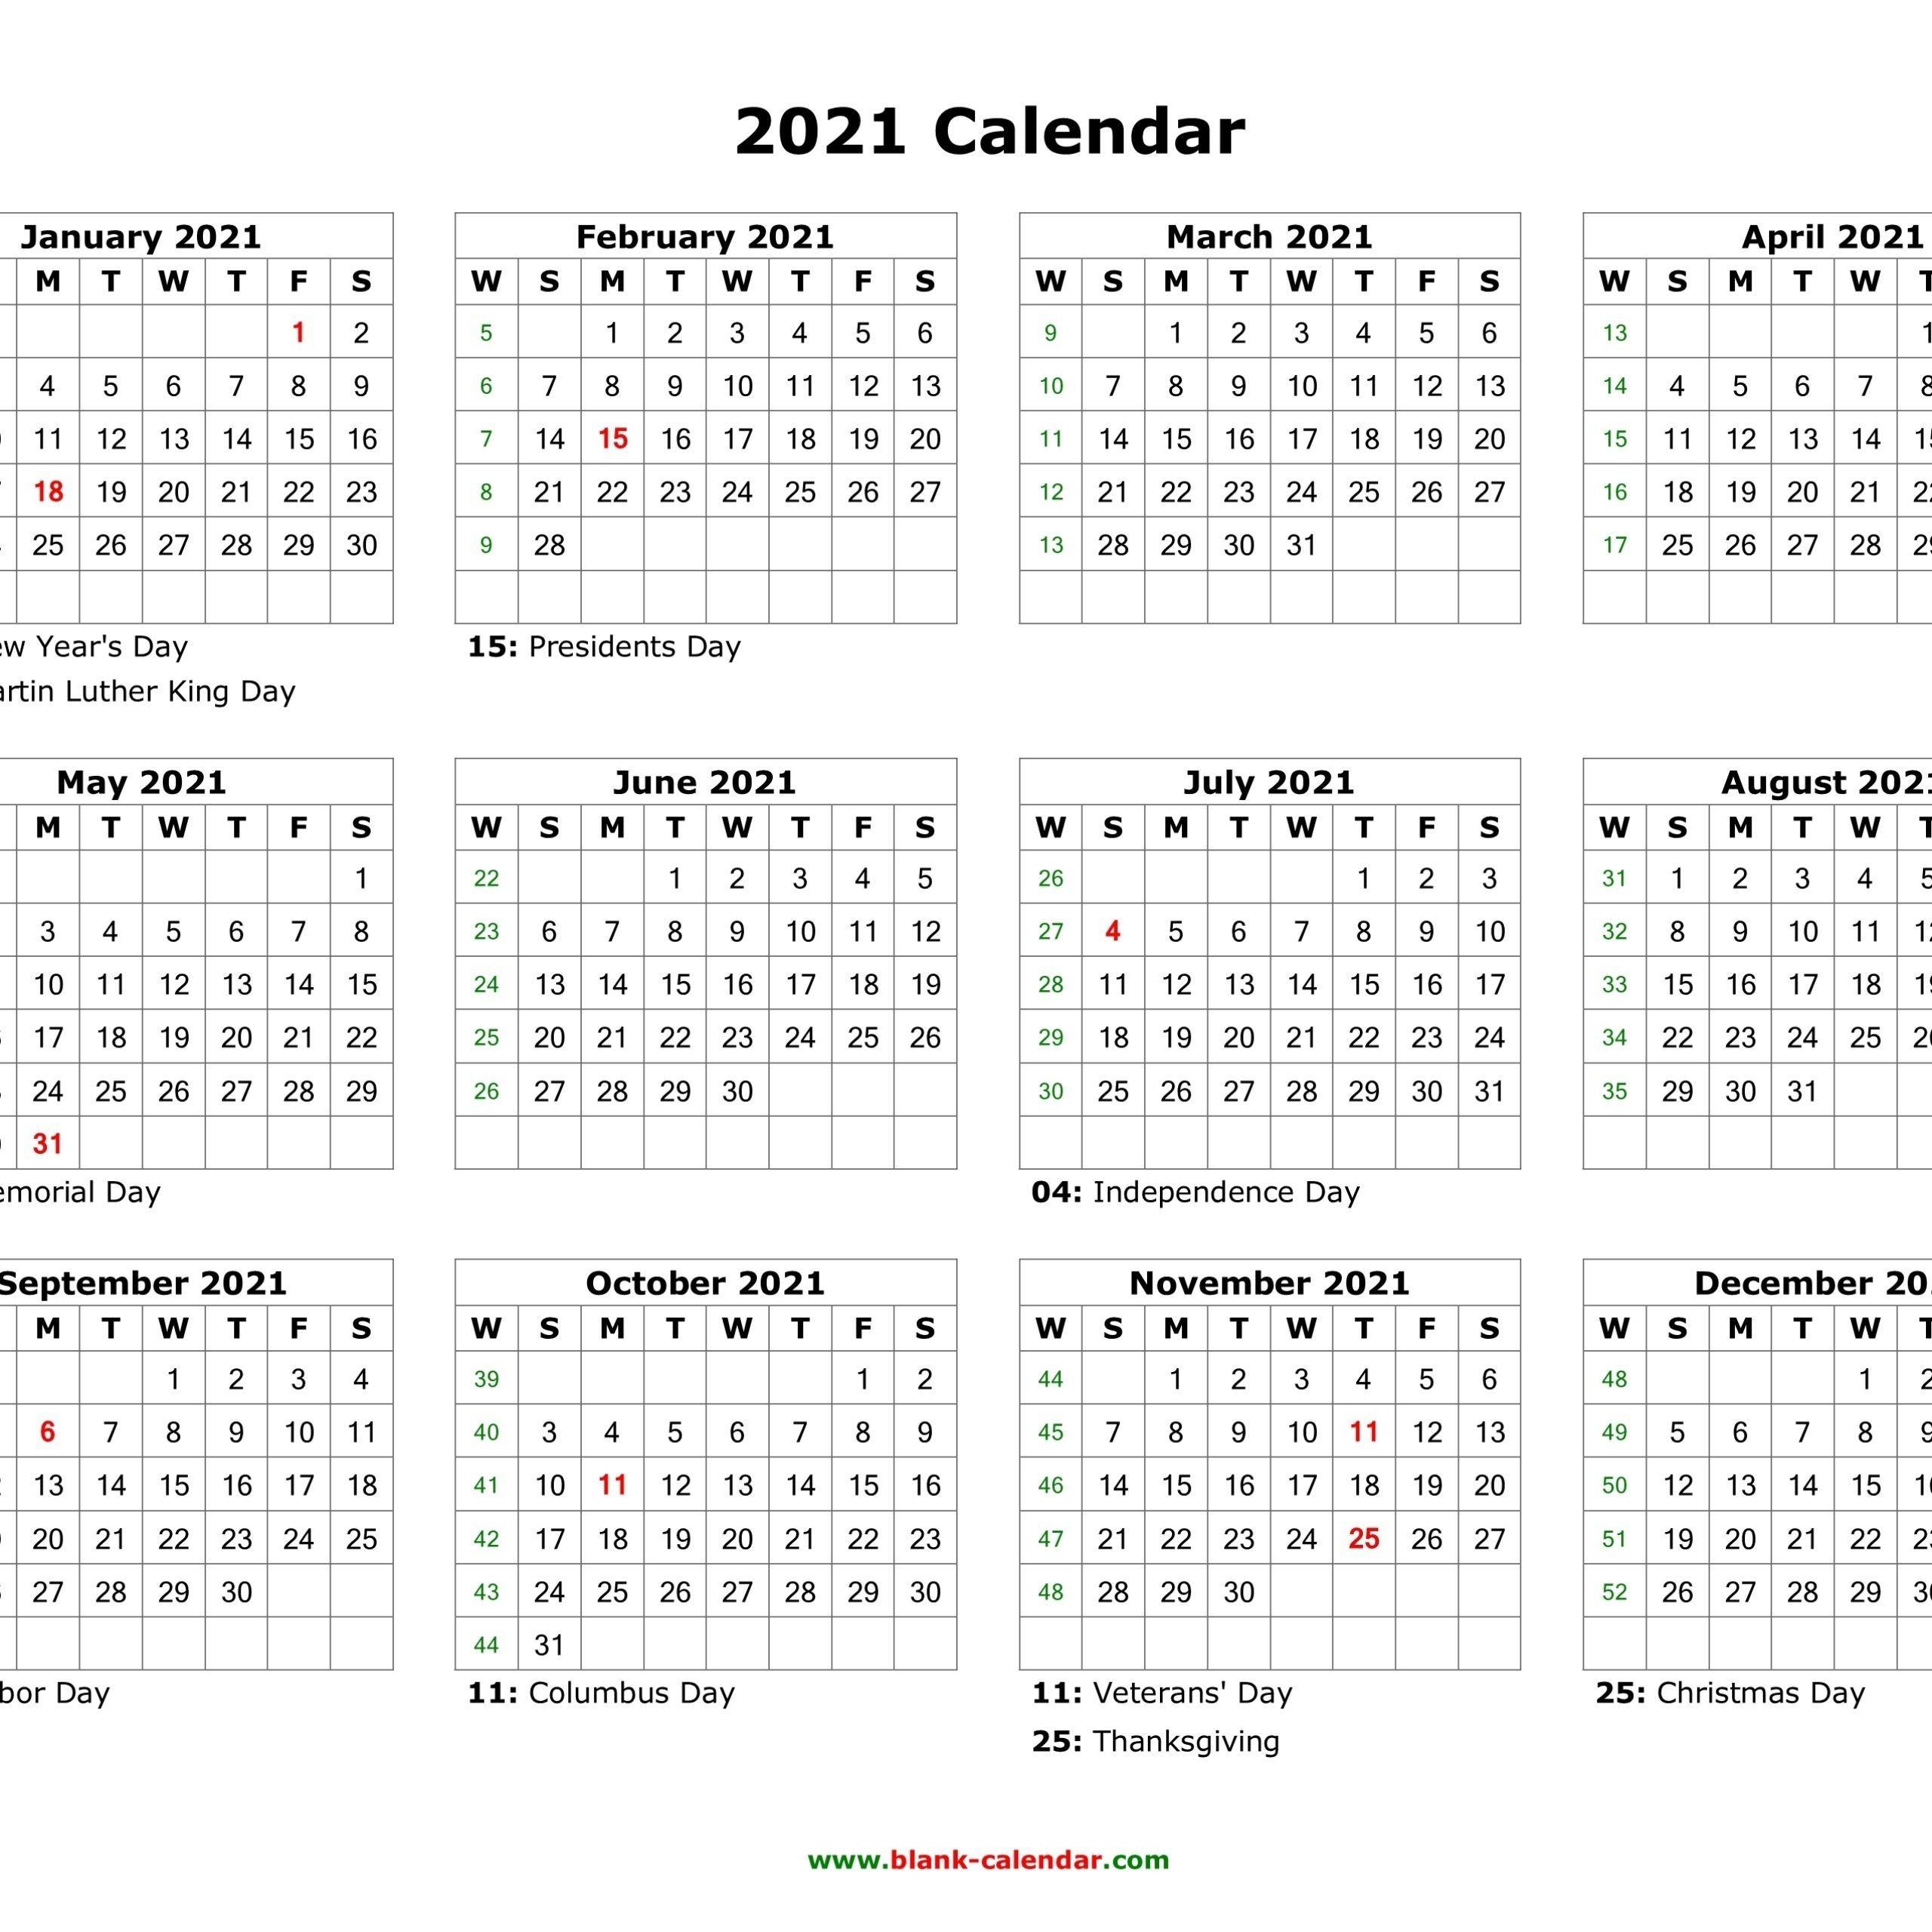 2021 Calendar Editable Di 2020-2021 4 Shift Calendar